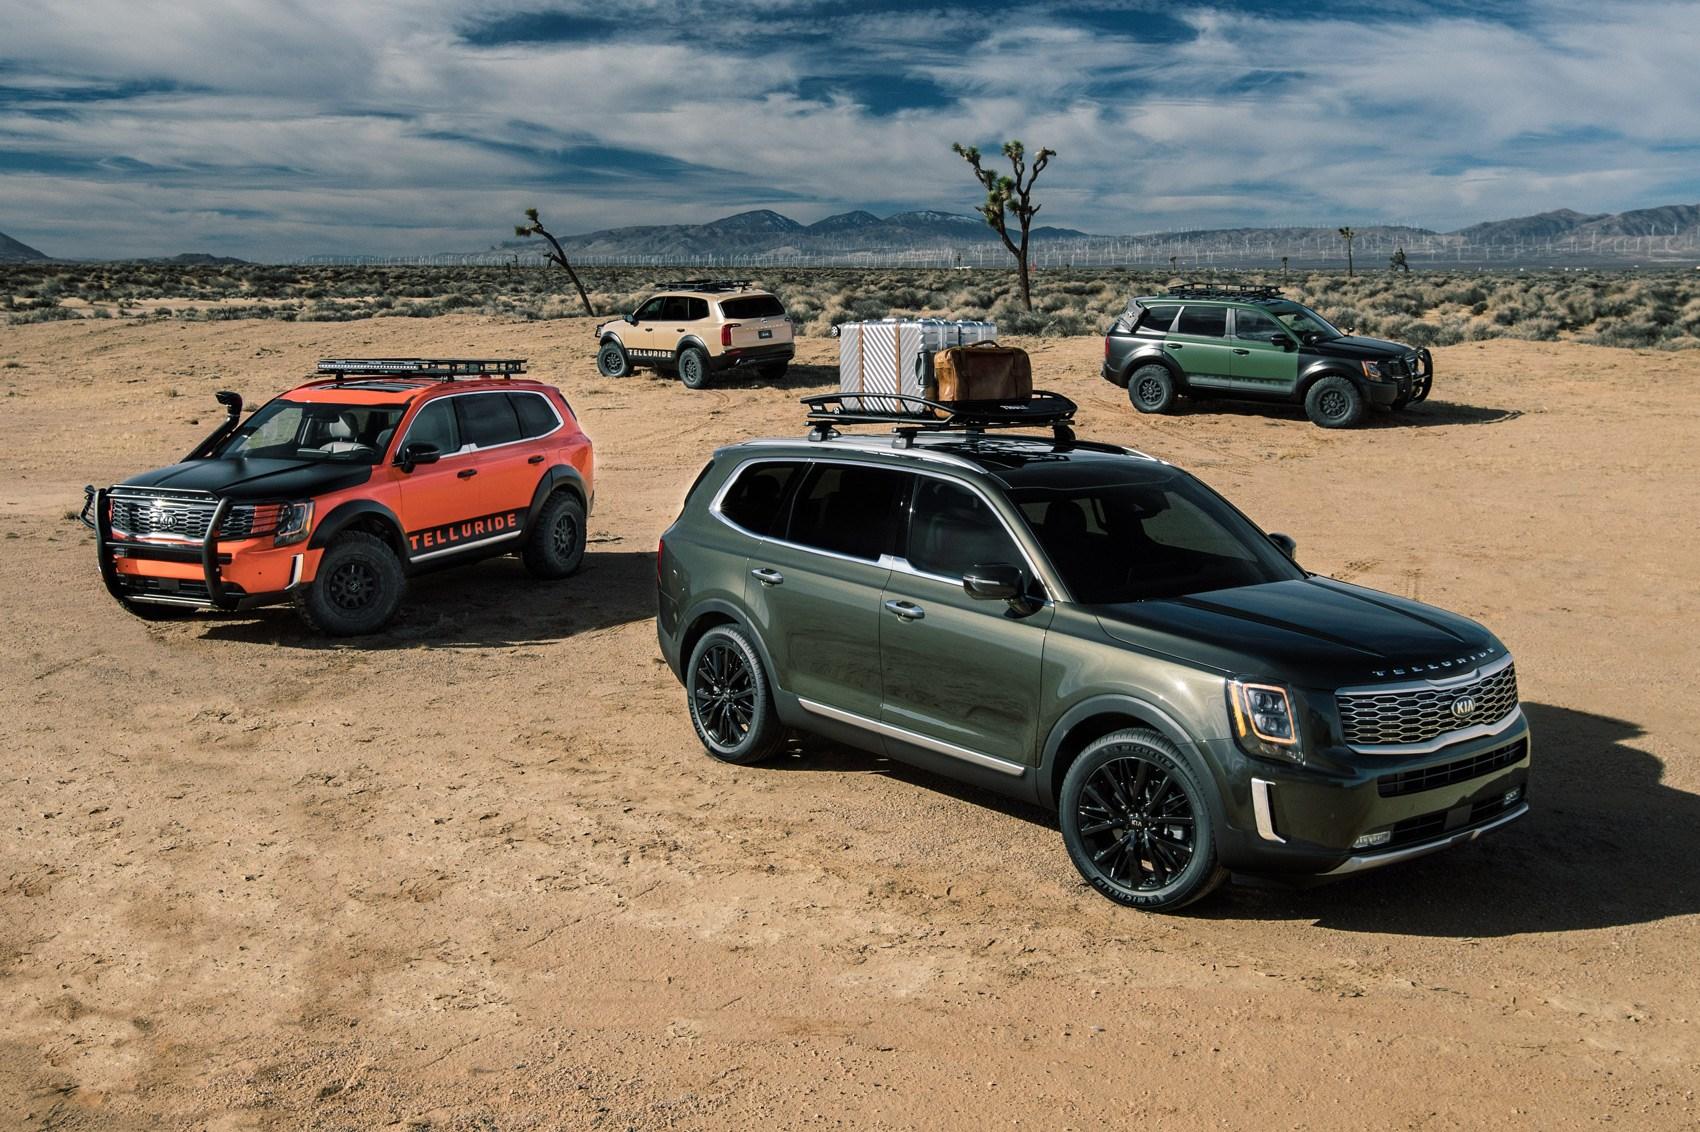 New Kia Telluride Suv Is Chunky Adventure Goer Car Magazine